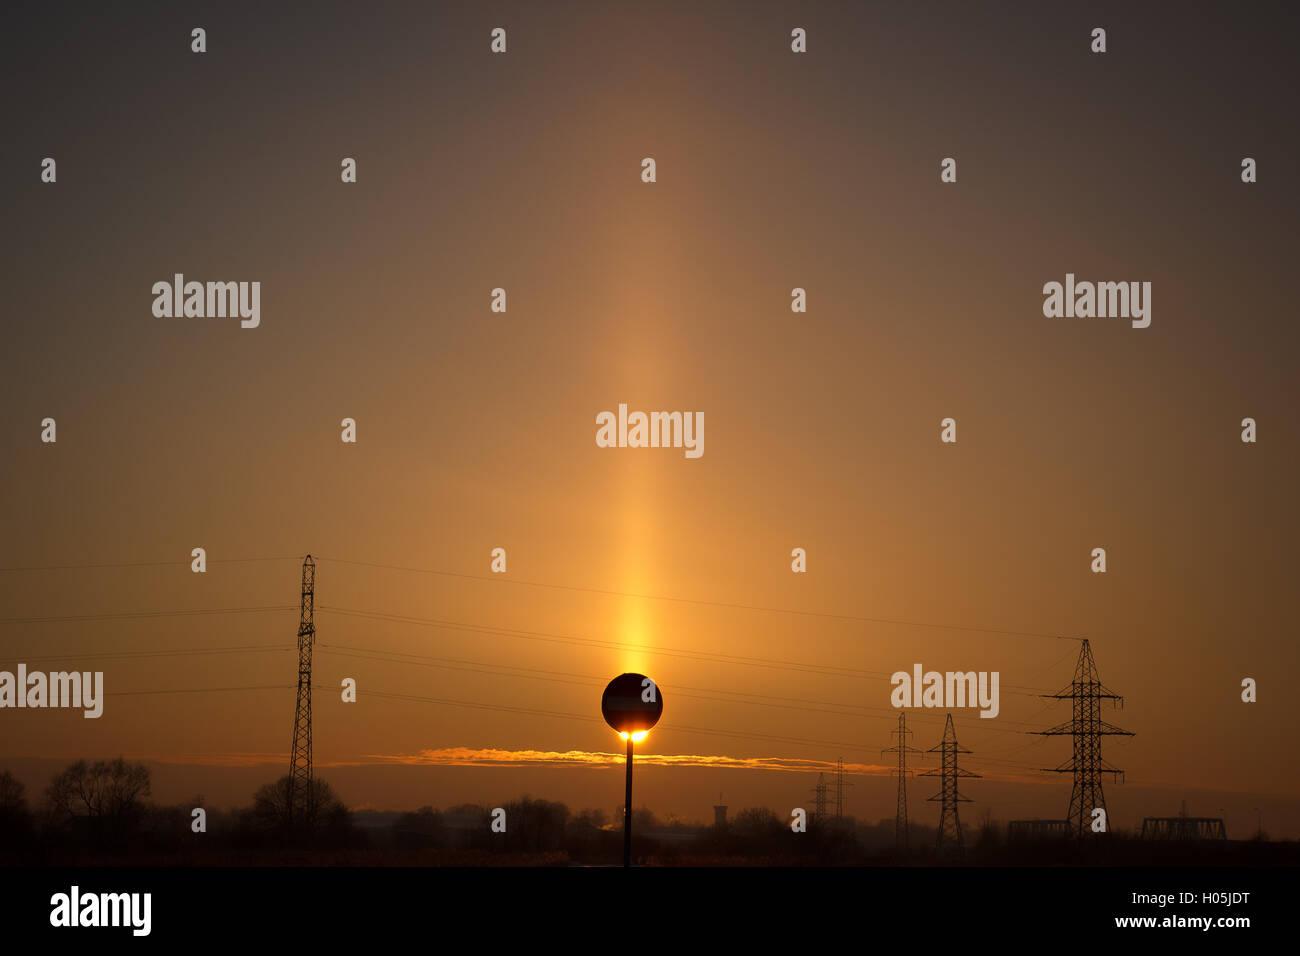 Evening solar eclipse - Stock Image